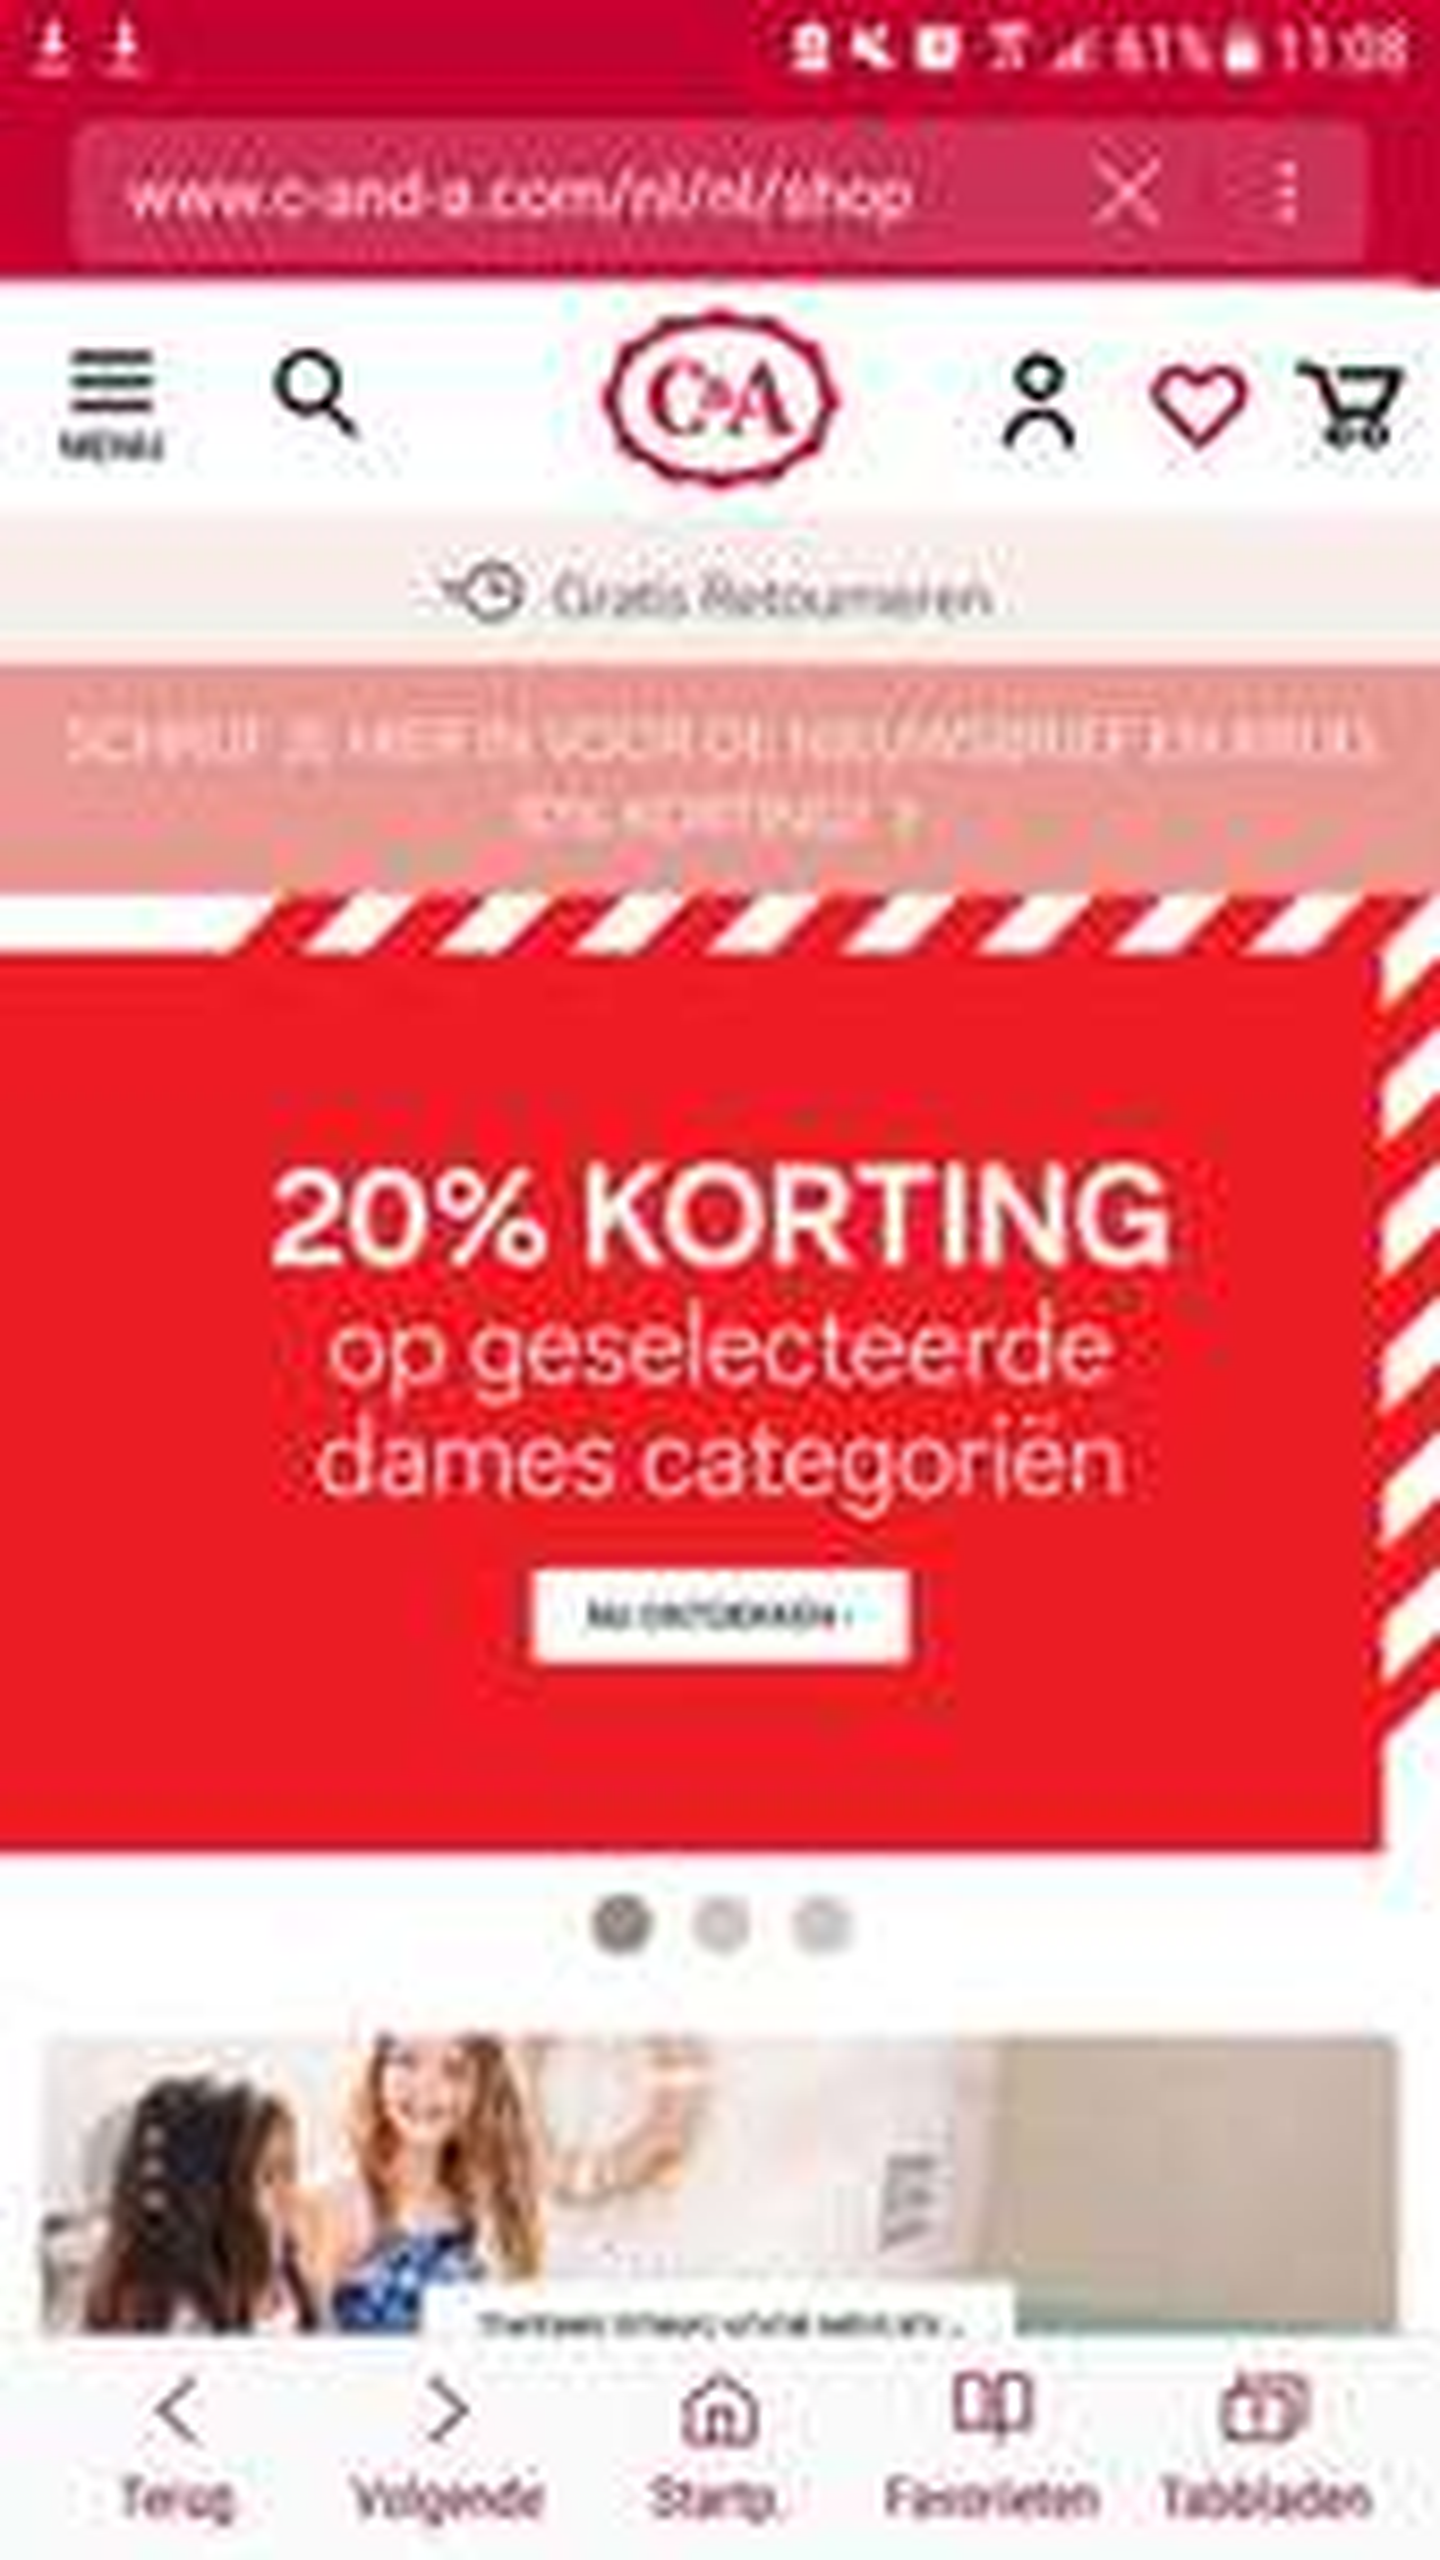 C&A 20% korting geselecteerde dames categoriën